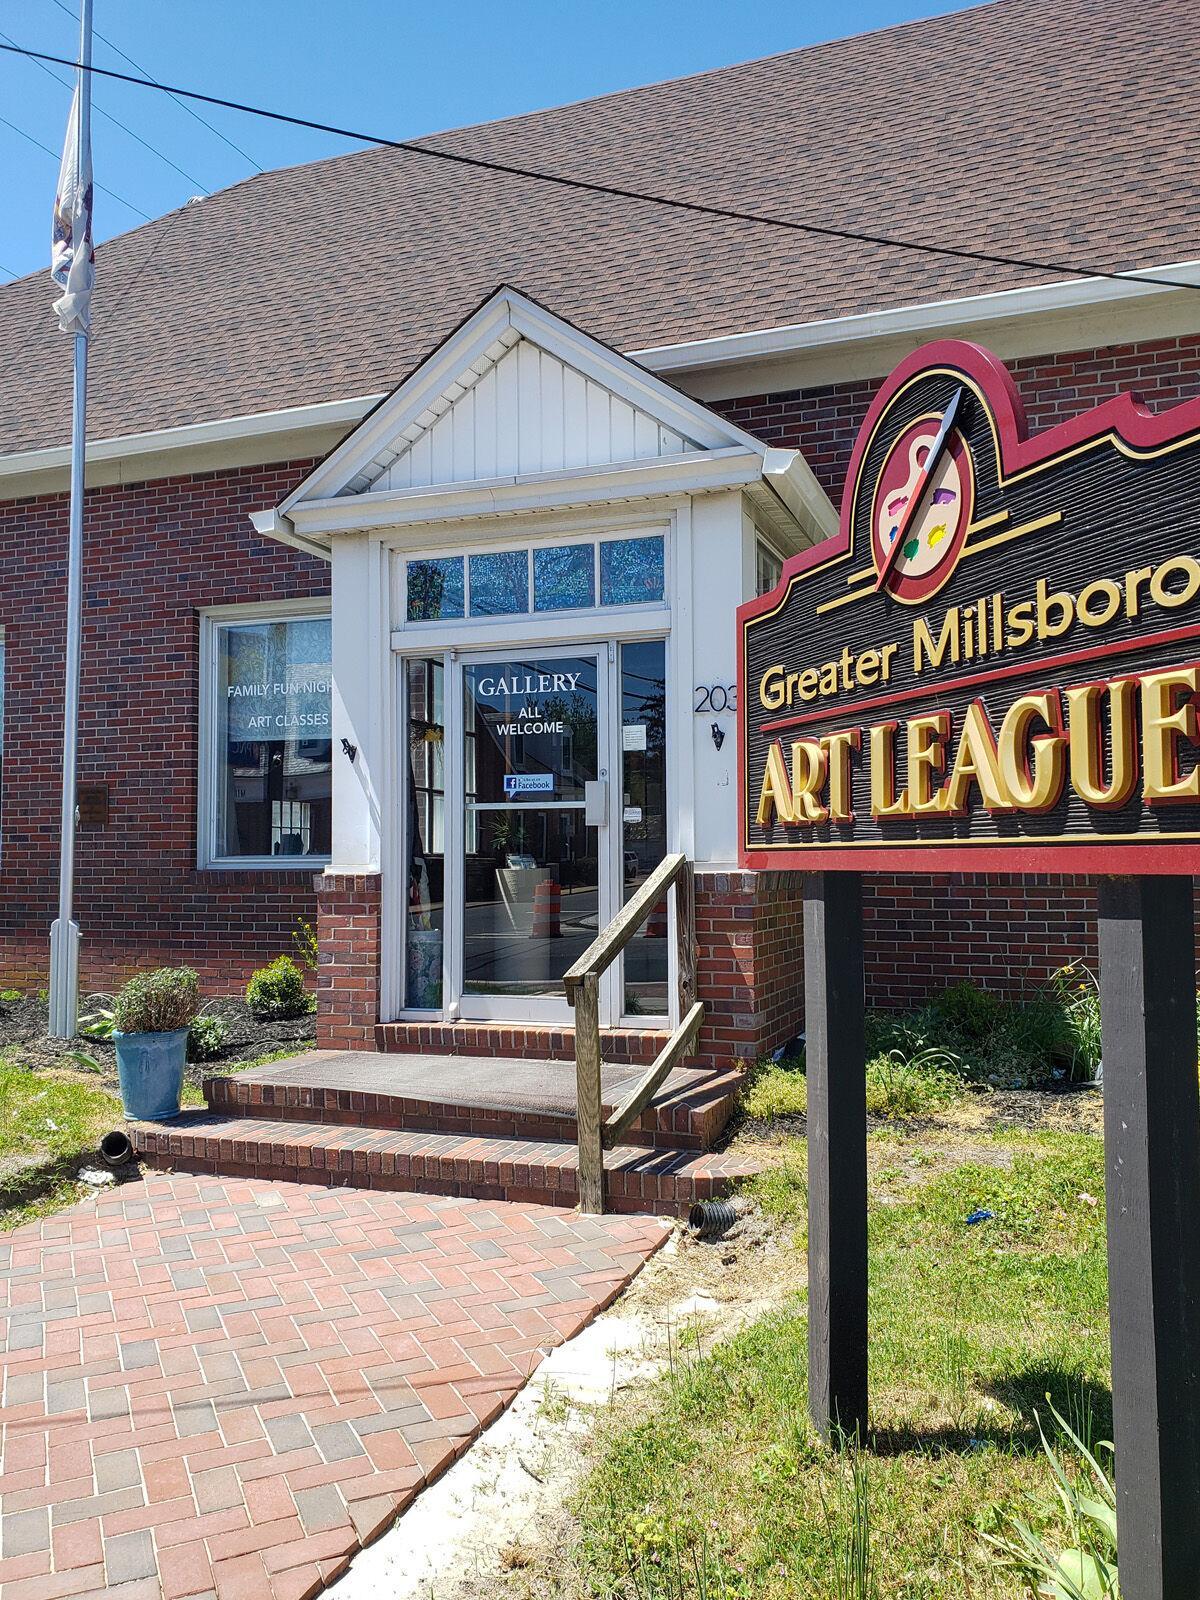 Millsboro Art League